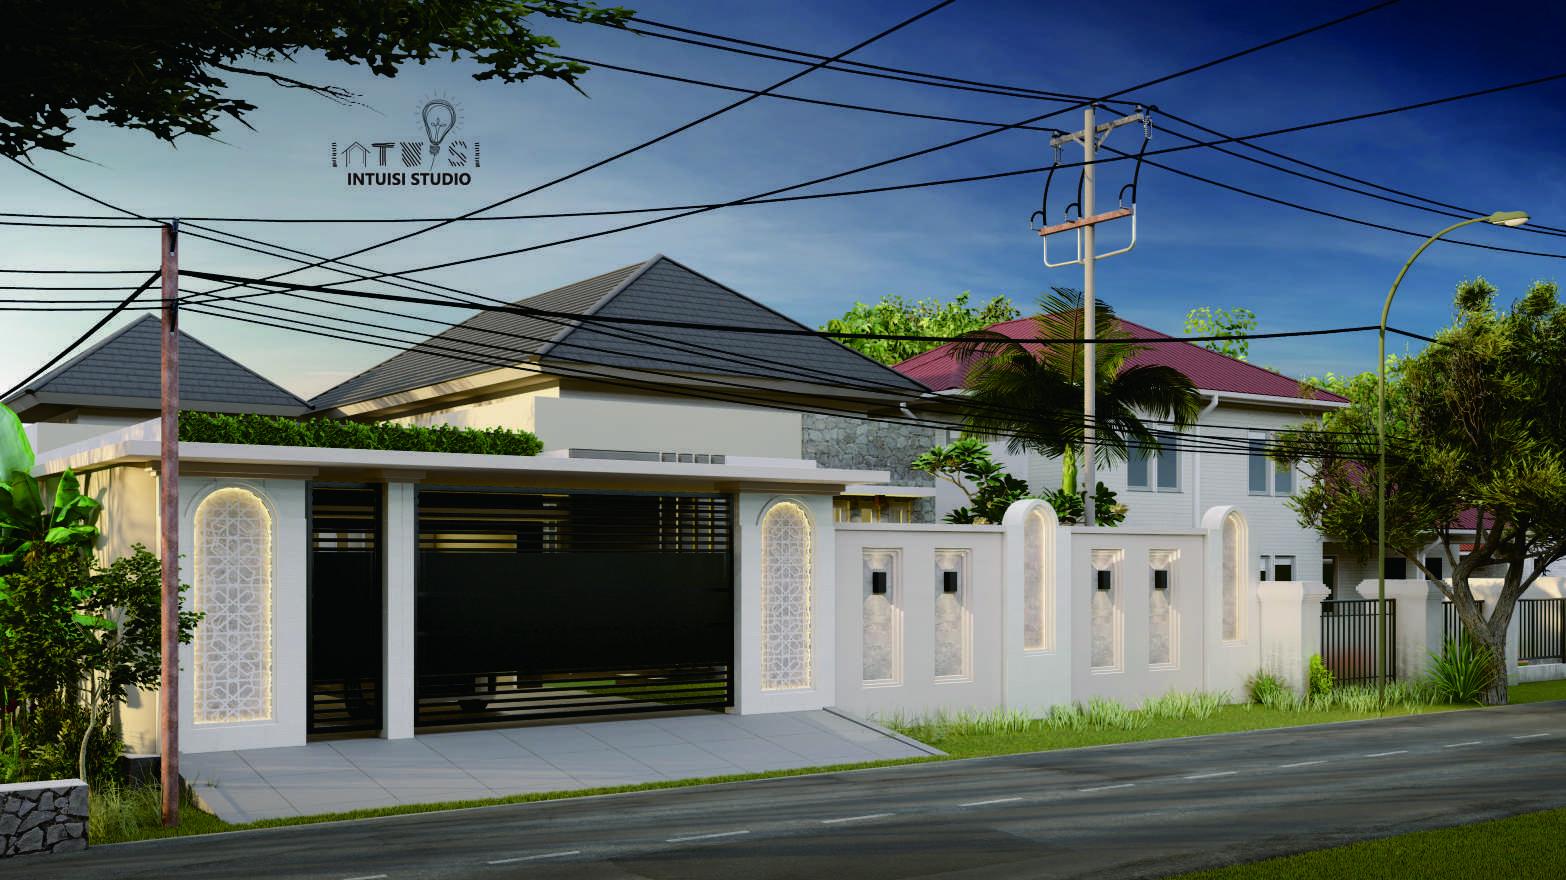 Intuisi Studio Desain Pagar Kabupaten Jombang, Jawa Timur, Indonesia Kabupaten Jombang, Jawa Timur, Indonesia Intuisi-Studio-Desain-Pagar   133003